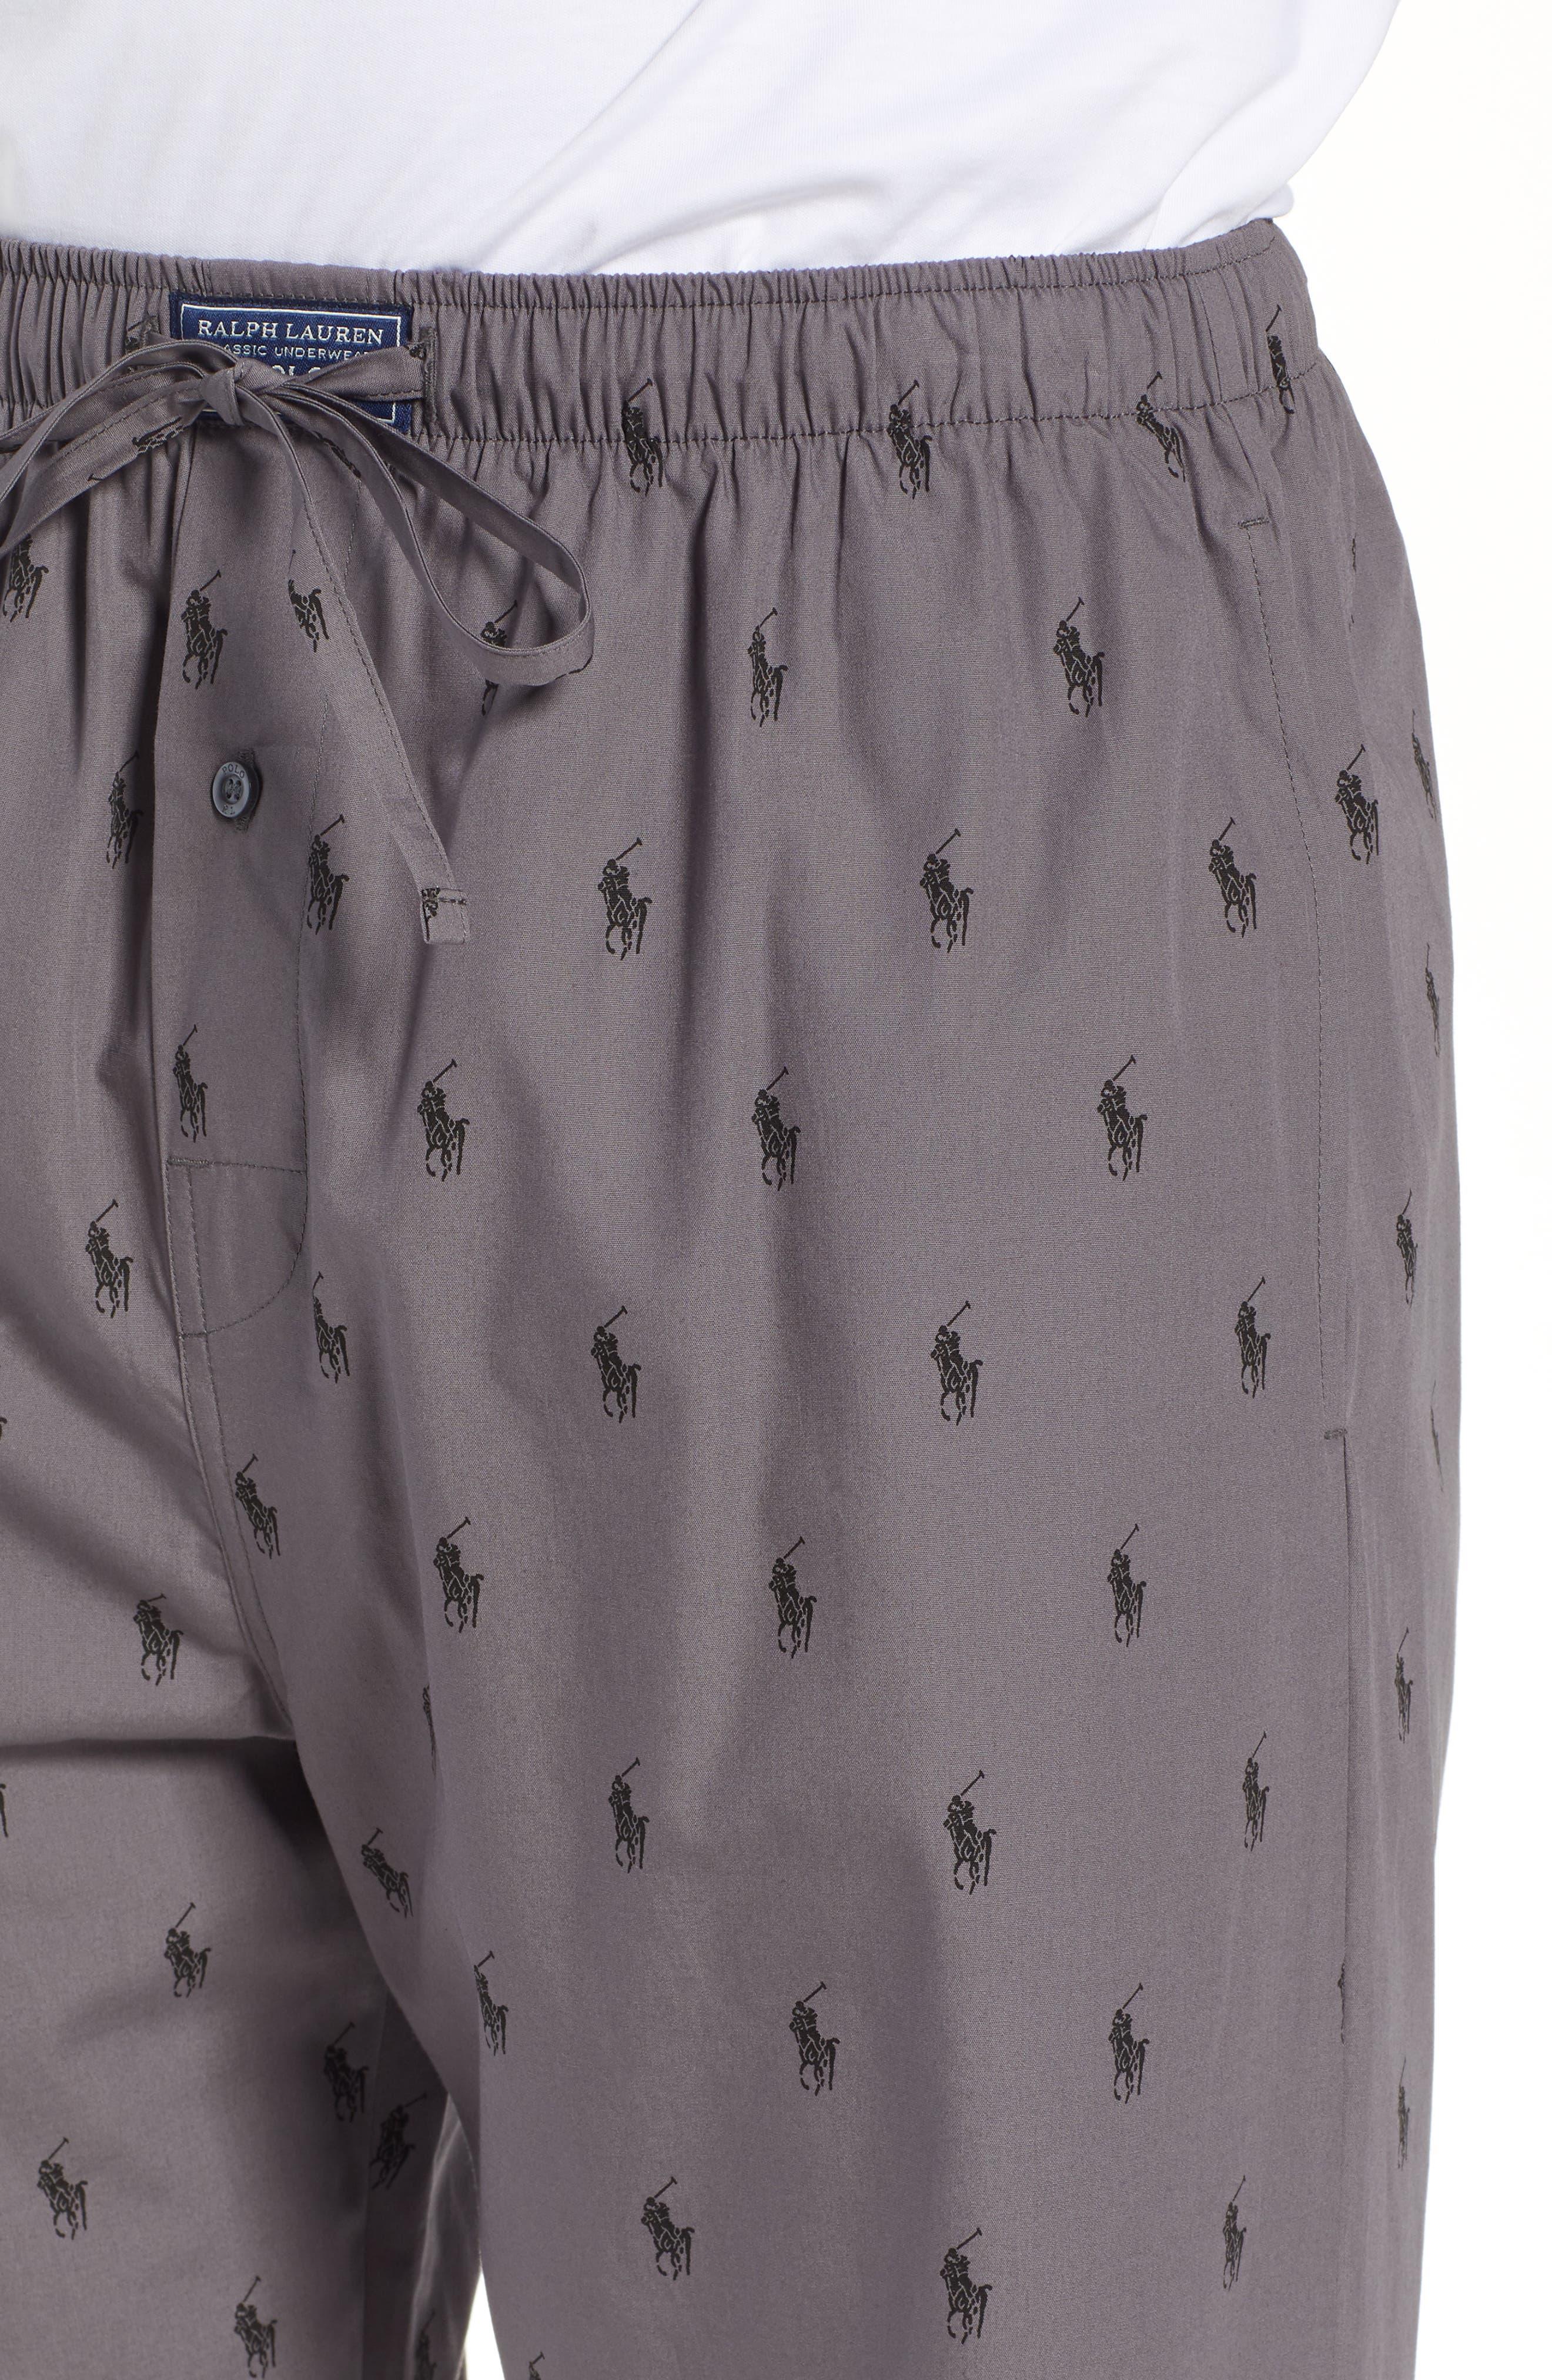 RALPH LAUREN,                             Polo Ralph Lauren Woven Pajama Pants,                             Alternate thumbnail 4, color,                             021